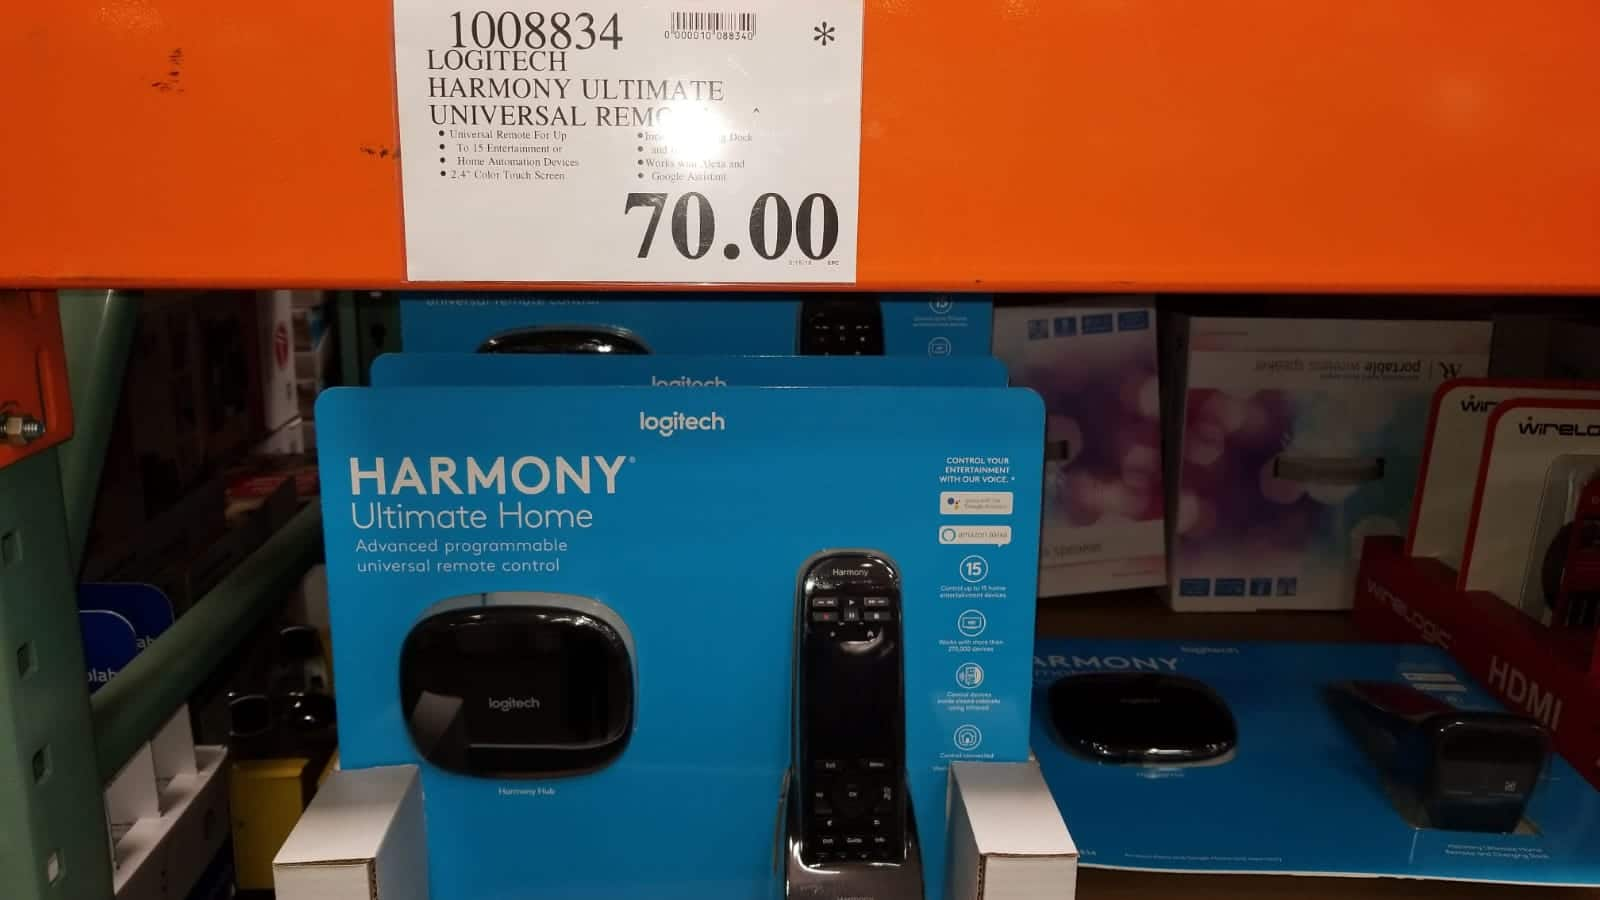 Costco B&M Logitech Harmony Ultimate Remote $70 YMMV